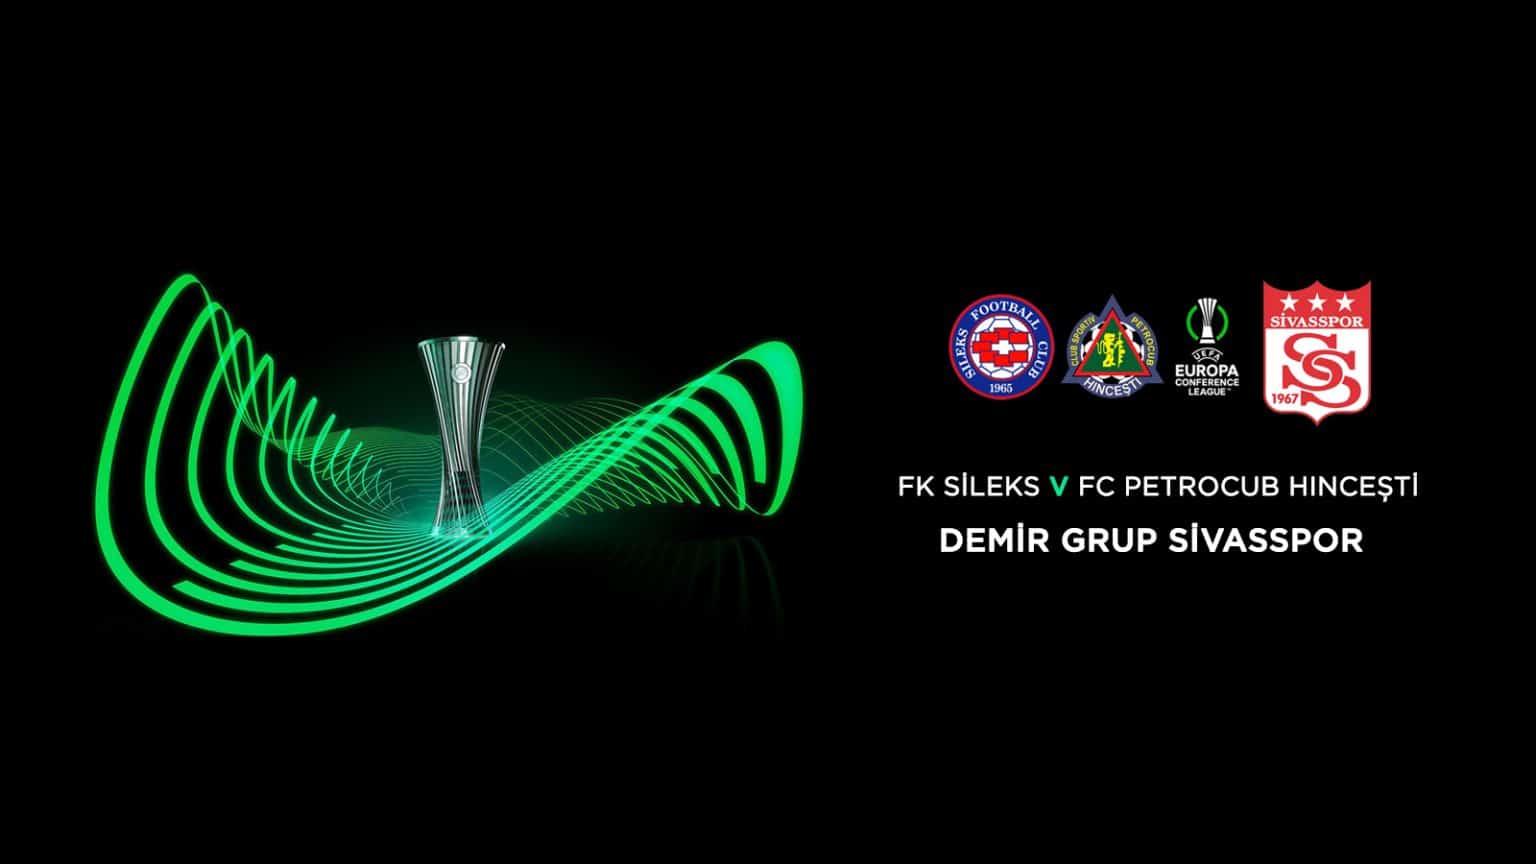 Uefa Conference League Sivasspor Gegner Stehen Fest